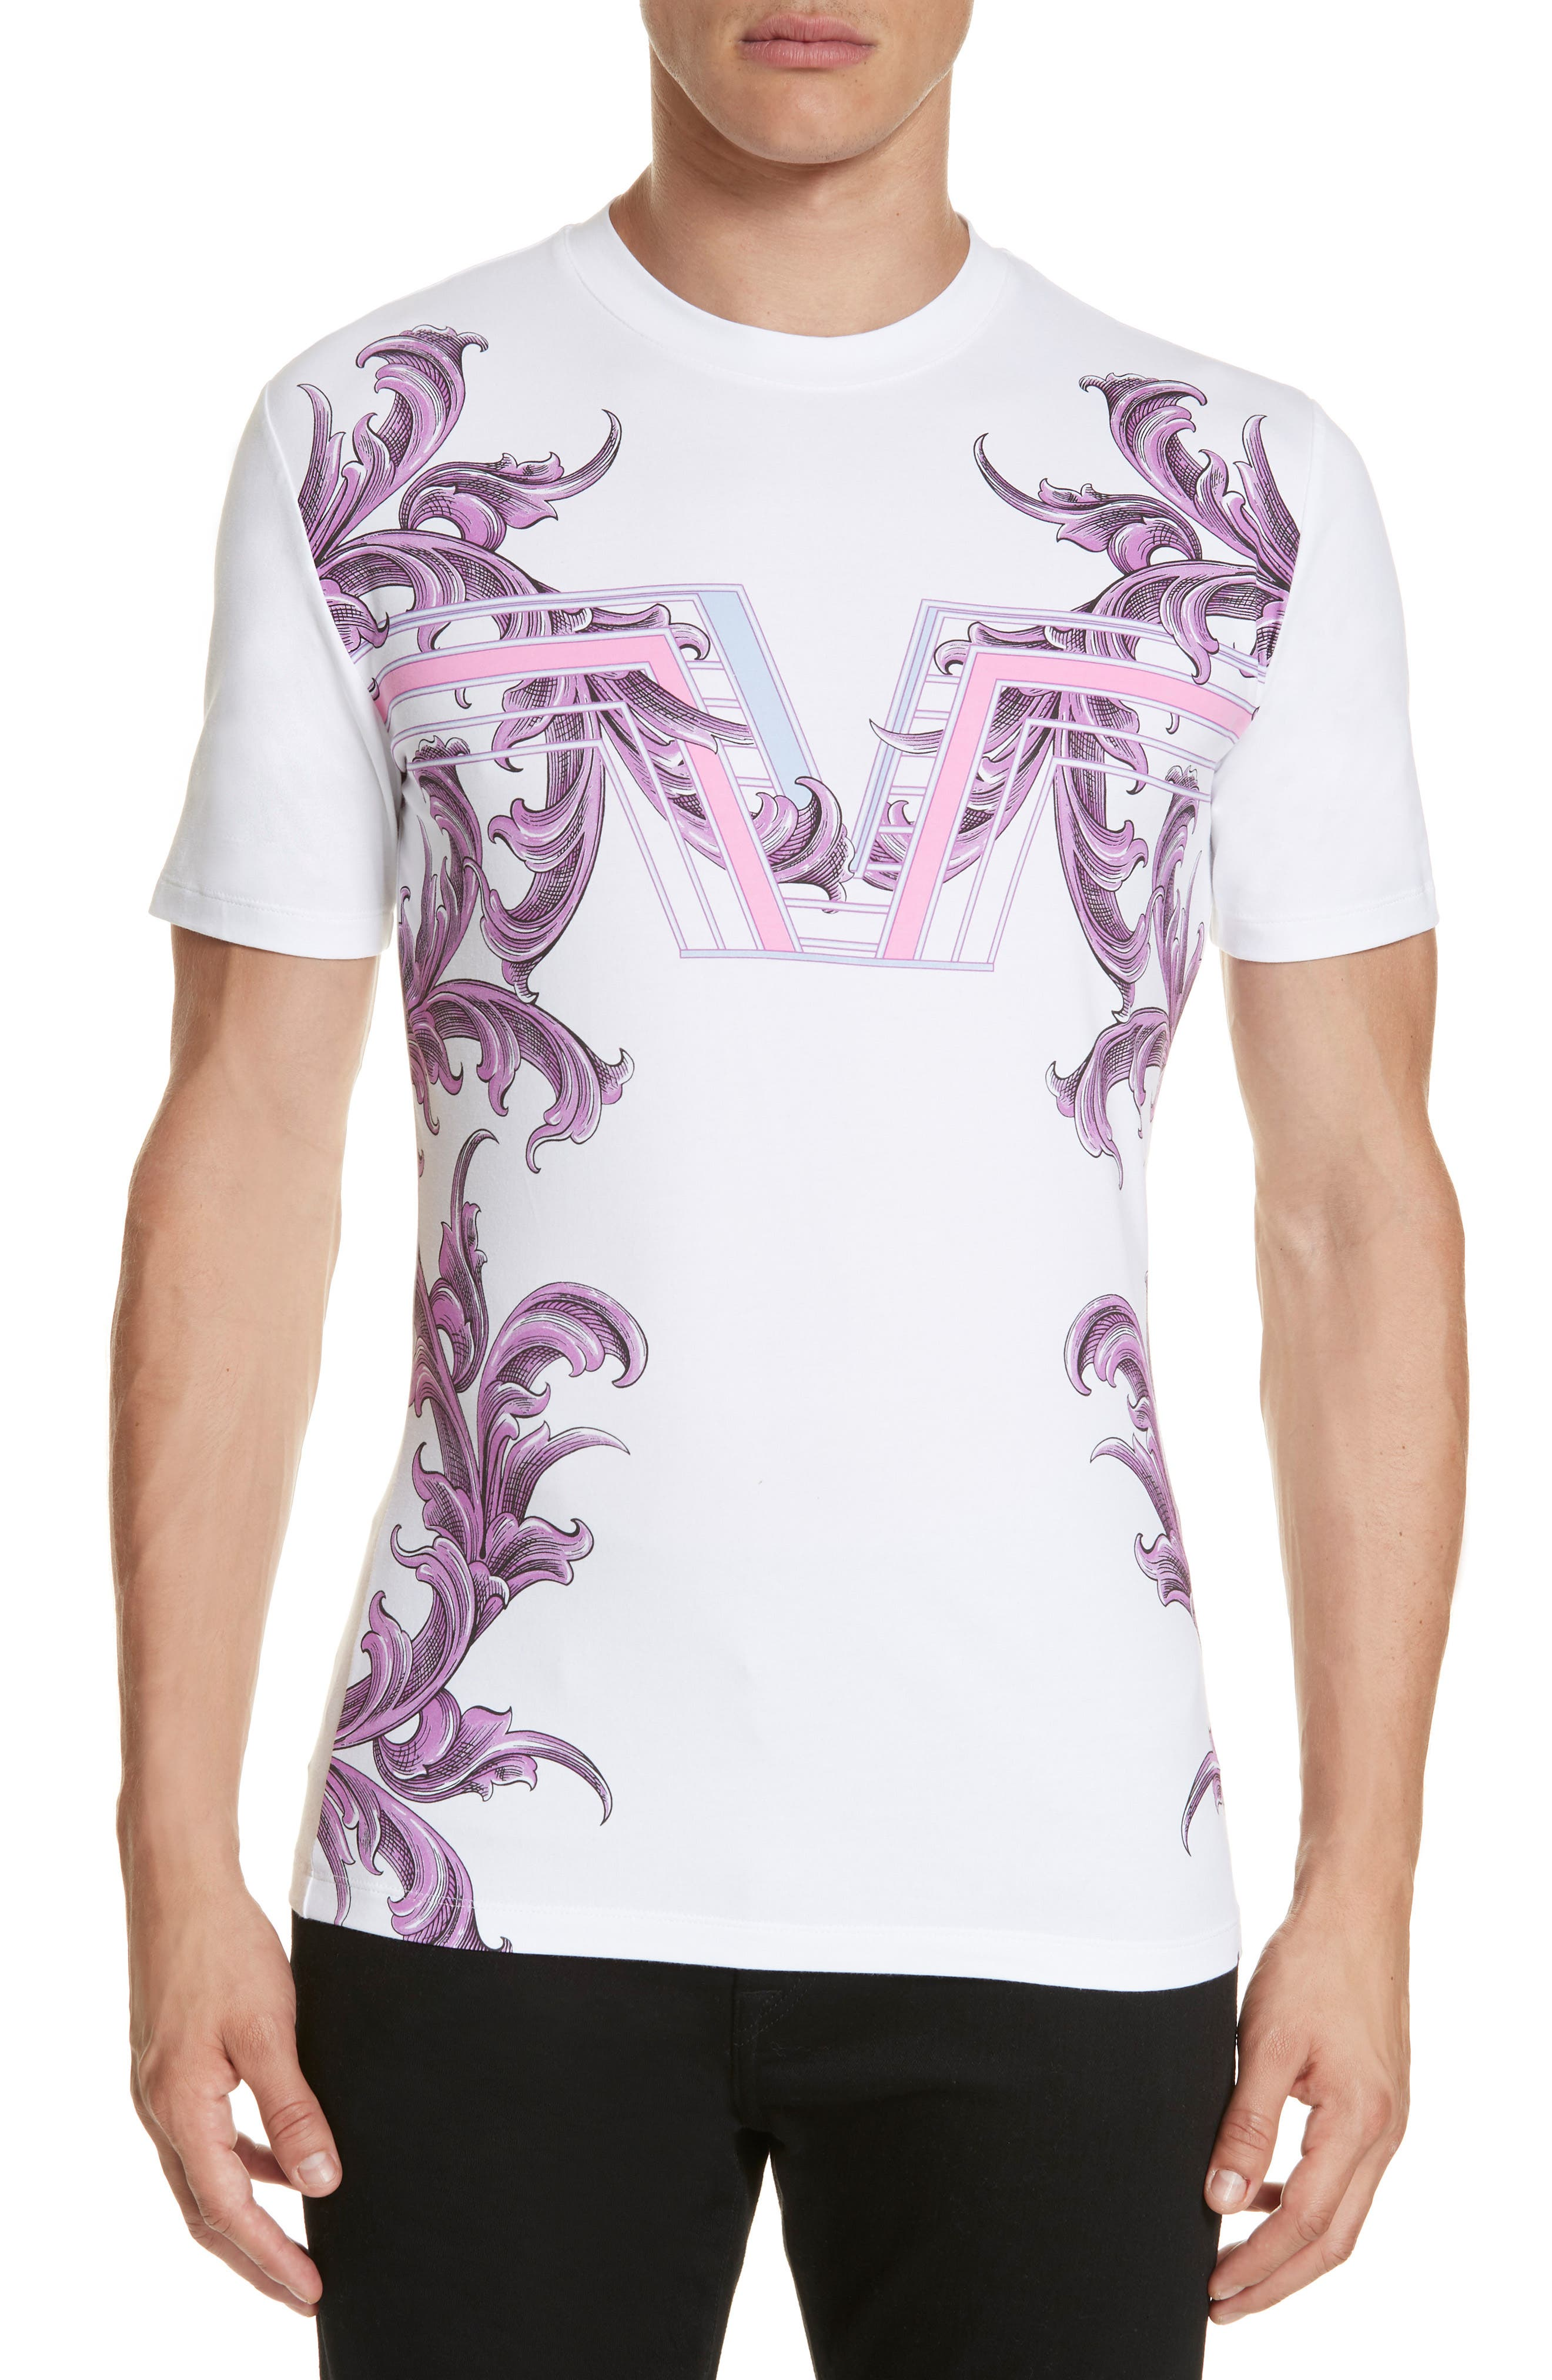 VERSACE COLLECTION, Filigree Print T-Shirt, Main thumbnail 1, color, 100